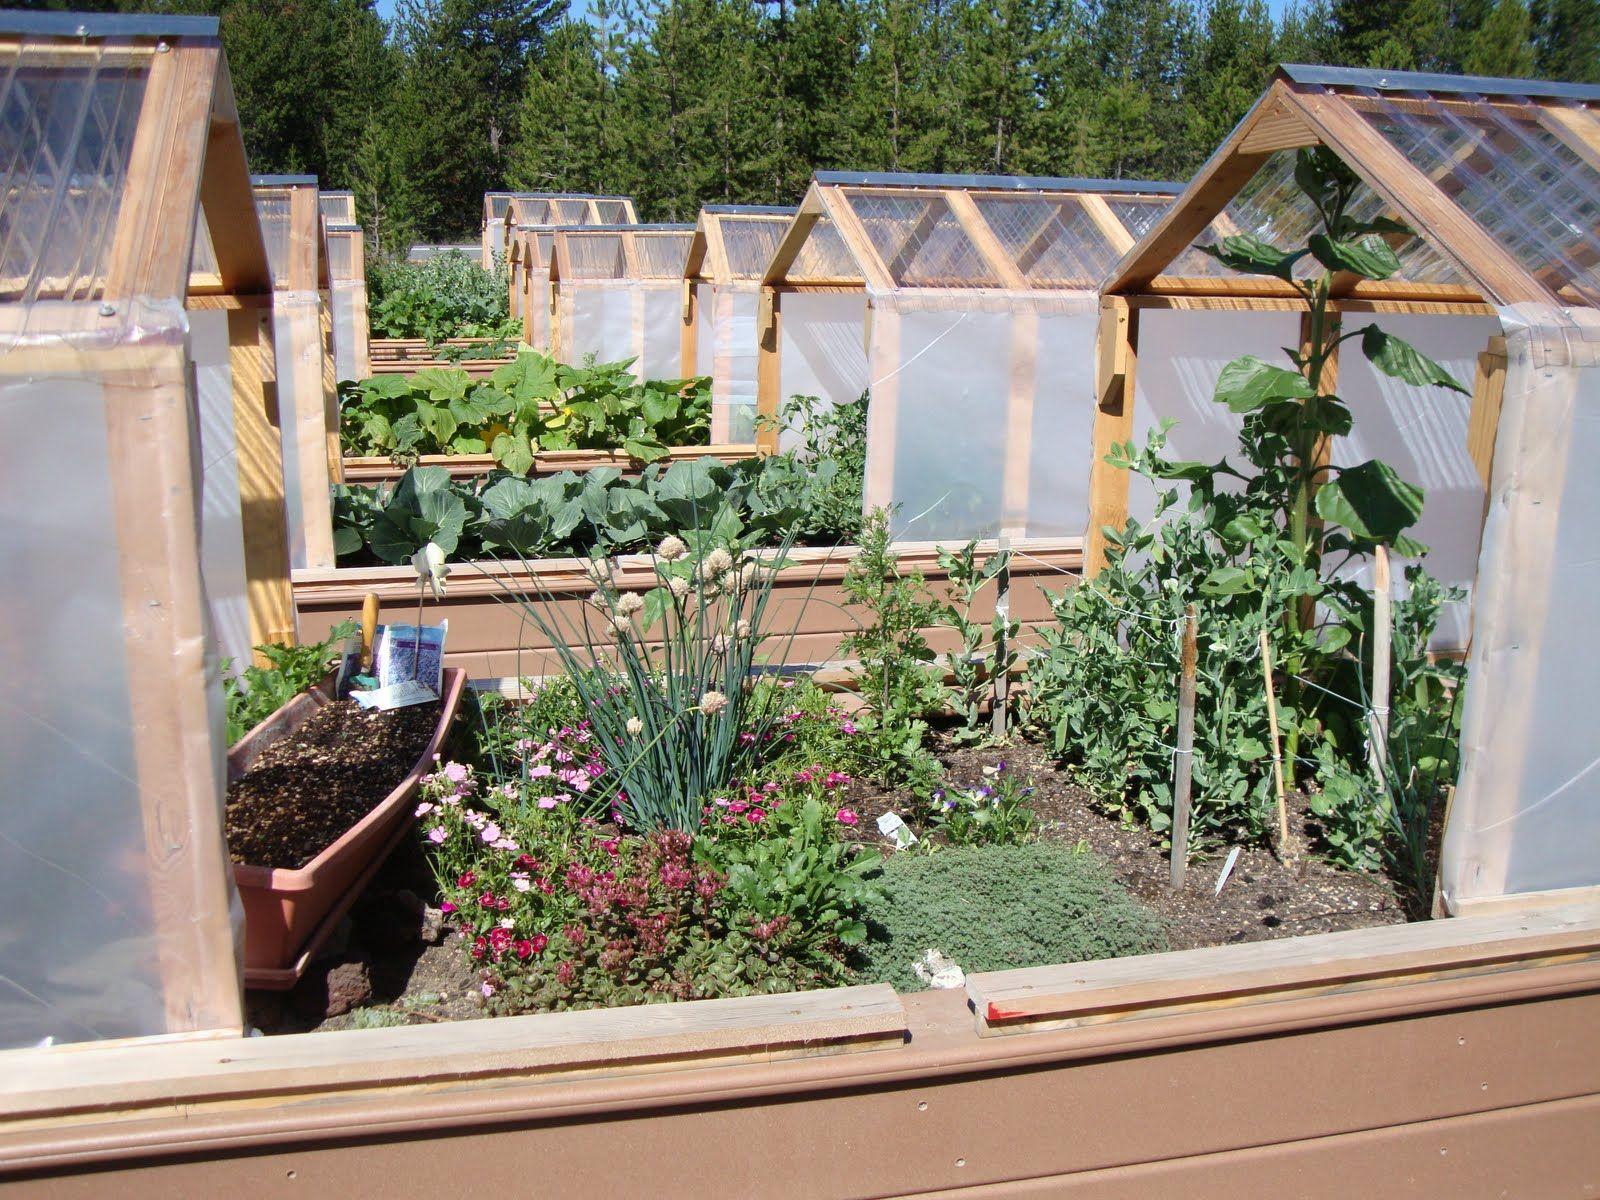 mini greenhouse mini greenhouses or raised beds both garden rh pinterest com